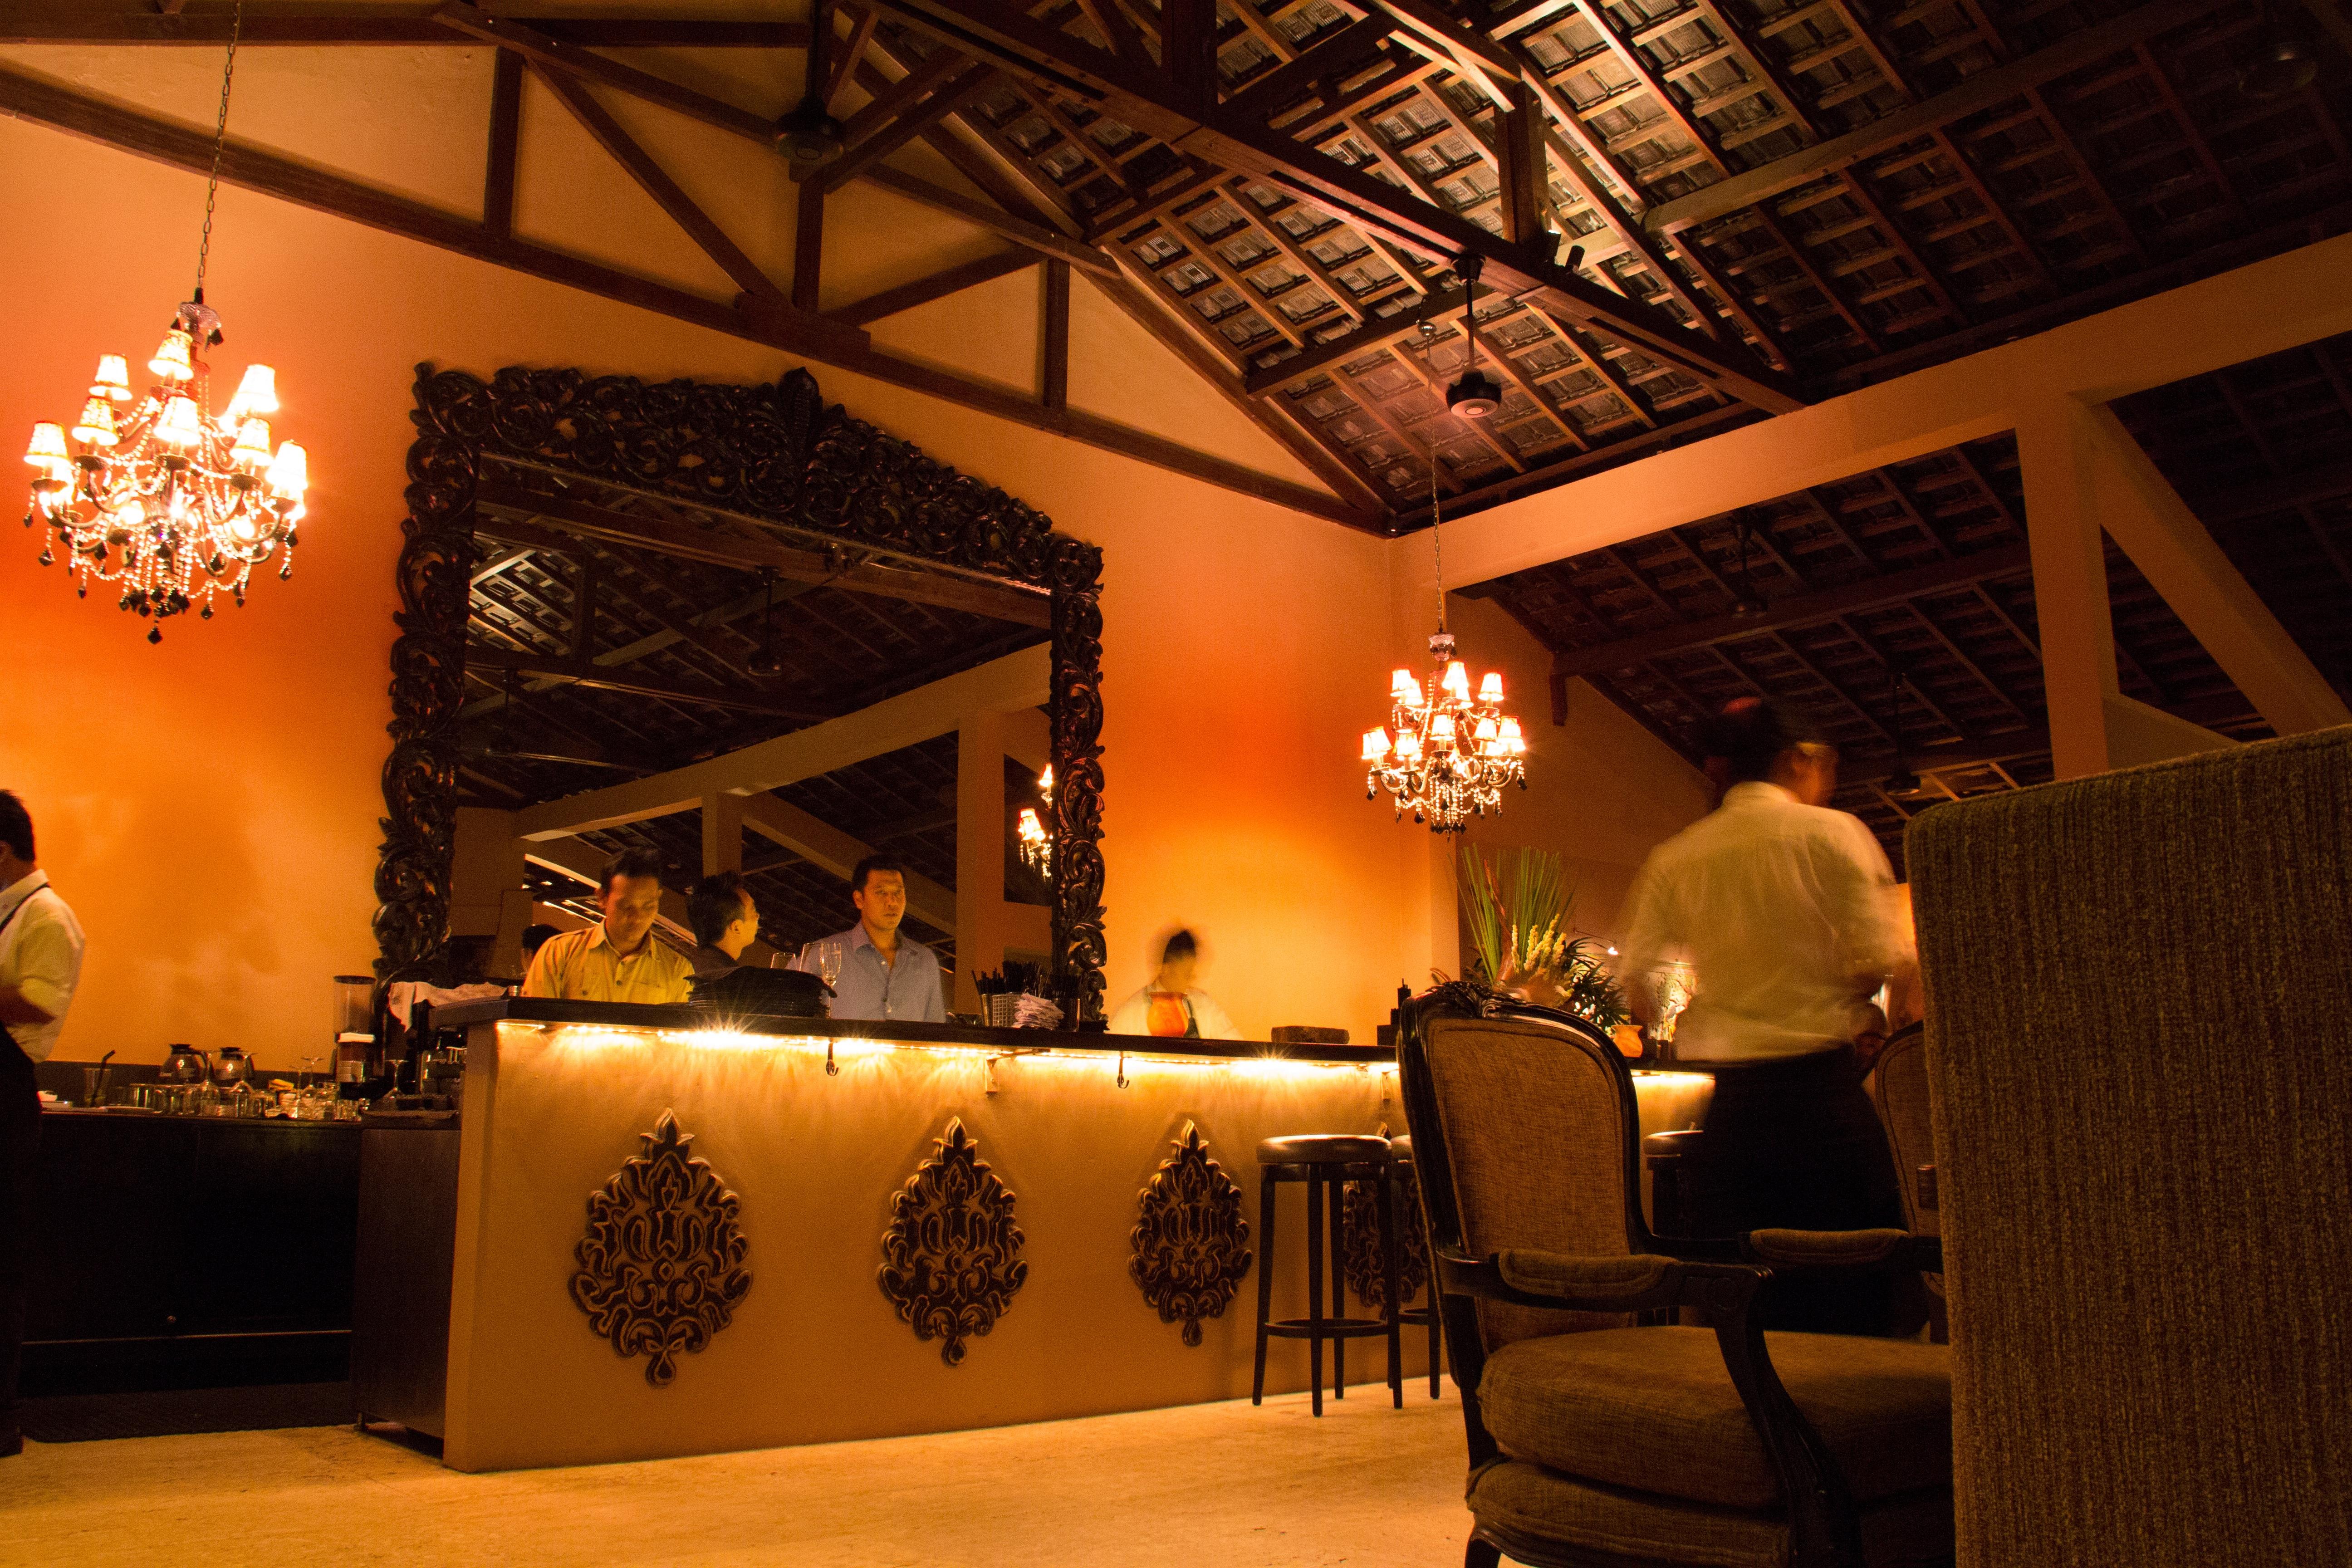 Fotos gratis : restaurante, celebracion, noche, cocina, iluminación ...